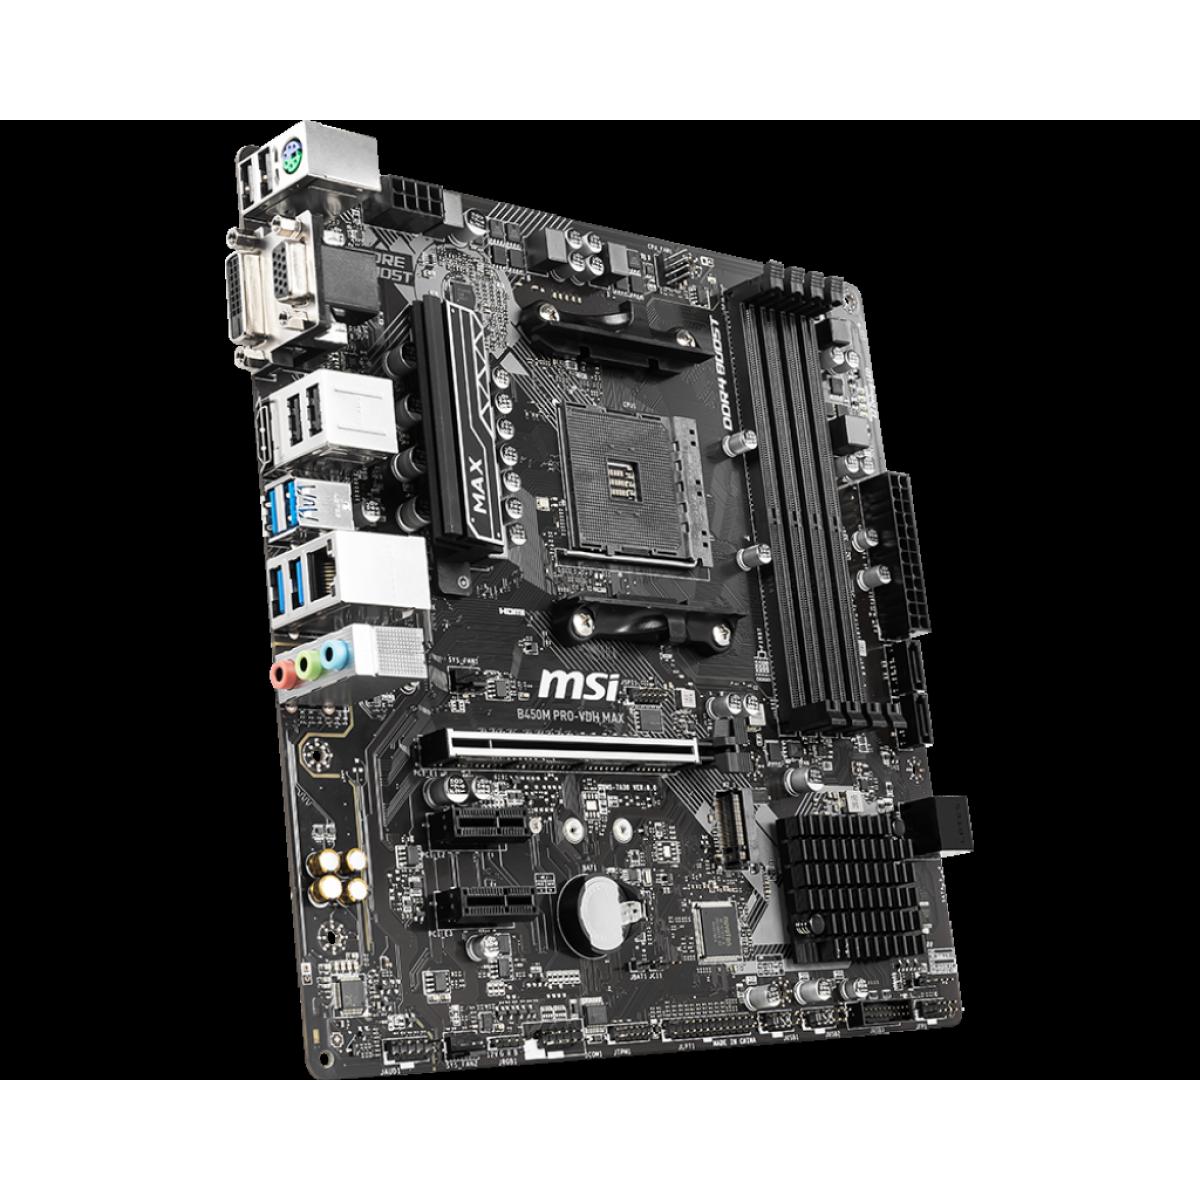 Placa Mãe MSI B450M PRO-VDH MAX, Chipset B450, AMD AM4, mATX, DDR4, 911-7A38-049